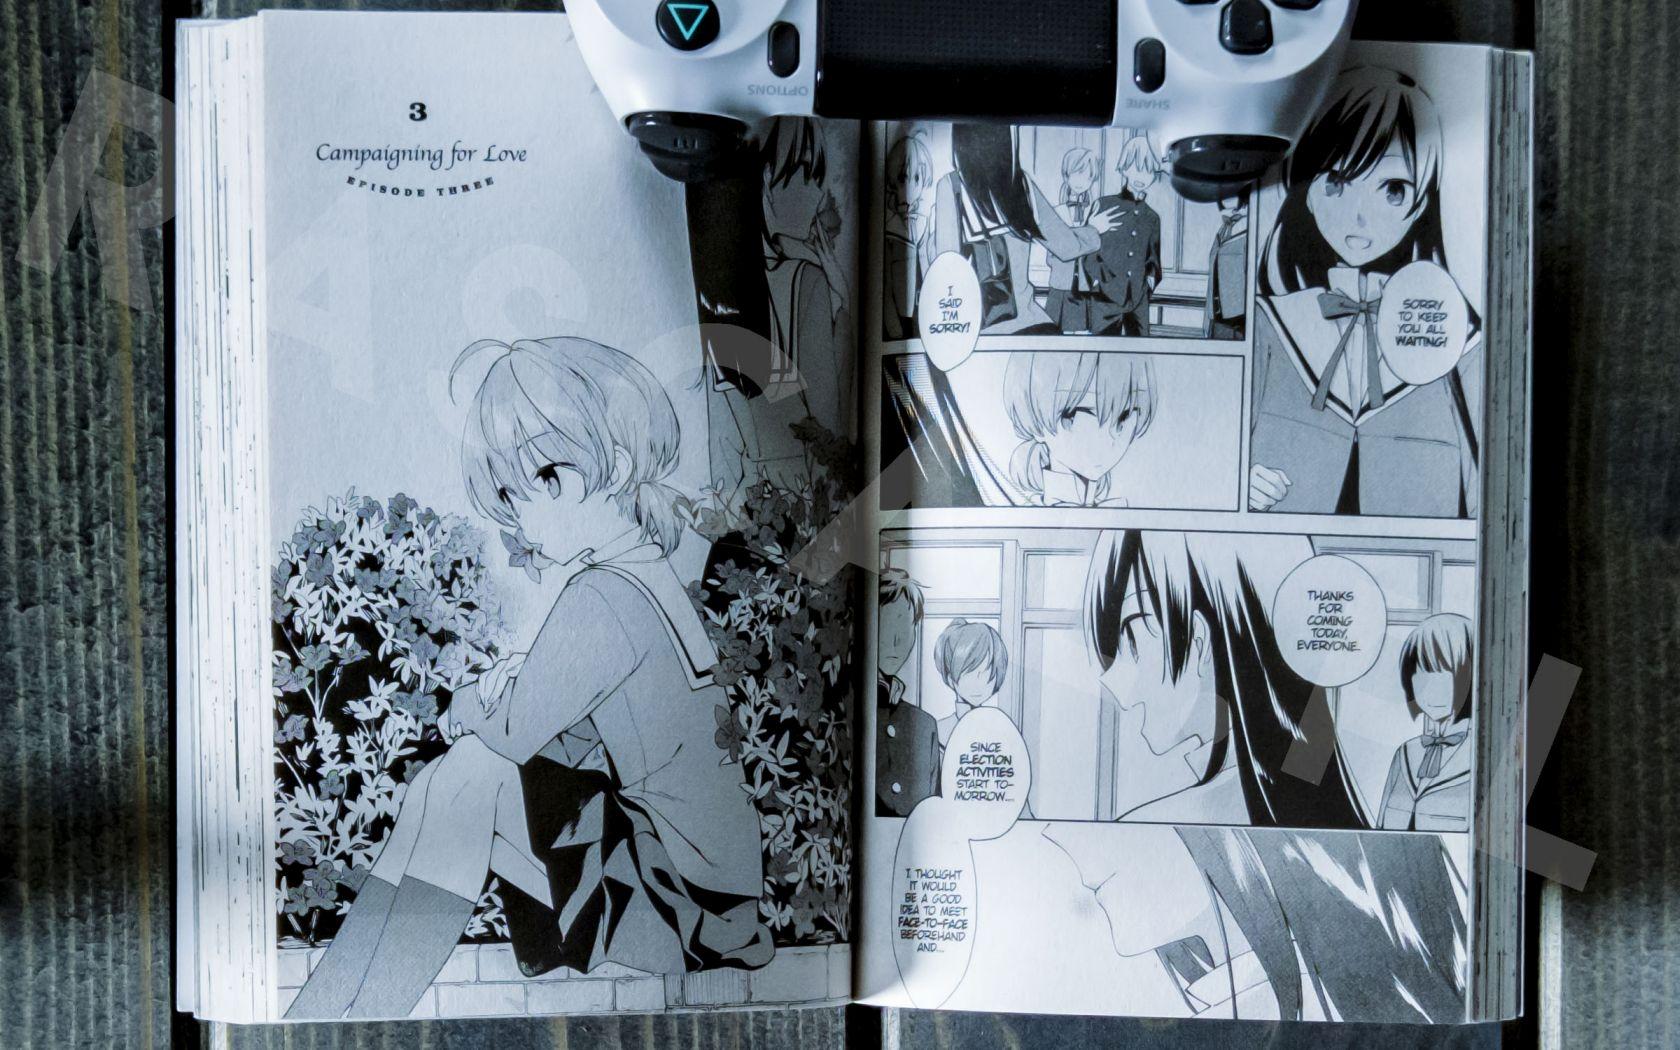 Yagate Kimi ni Naru (1) - Seven Seas - Nowości w kolekcji mangi (listopad 2020) - rascal.pl